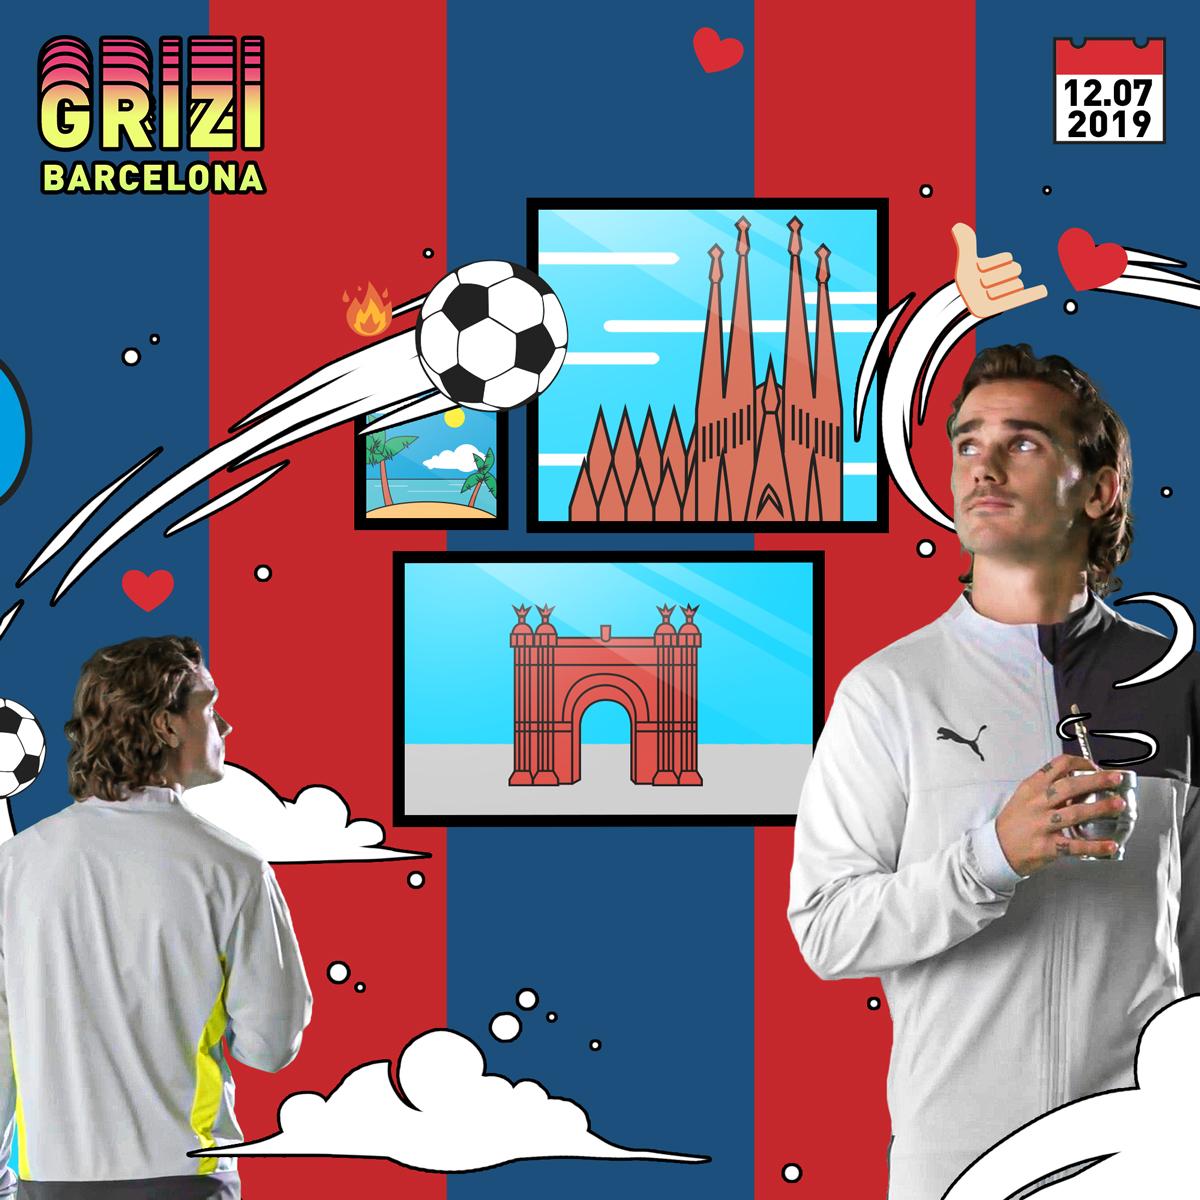 19AW_Social_IG_TS_Football_Griezmann-Special-Edition_FUTURE_Q4_2000x2000_010.jpg